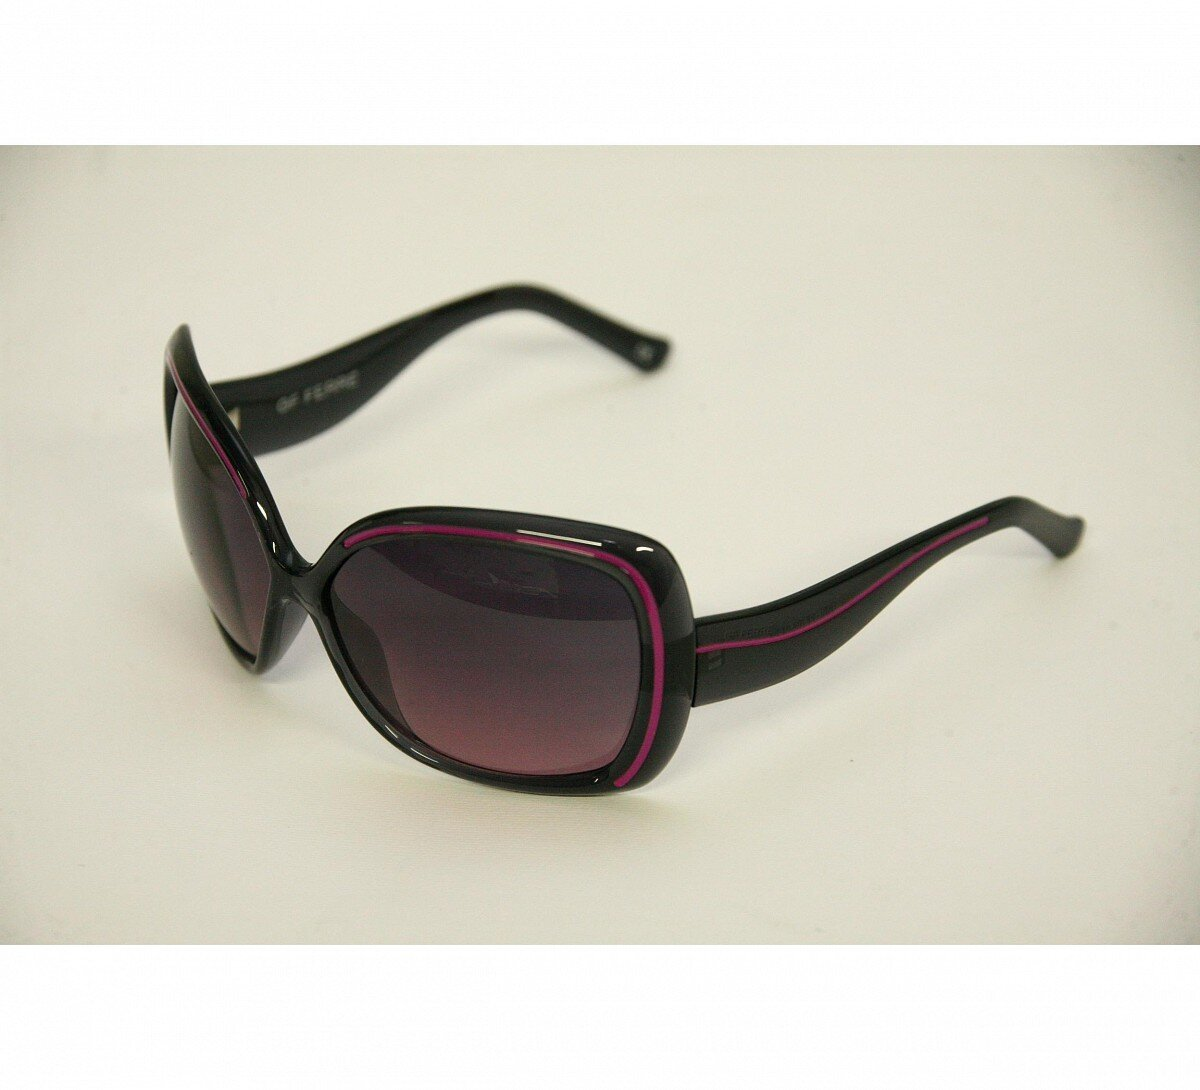 d1125f12d Dámske čierne slnečné okuliare Gianfranco Ferré s ružovými detailami |  Zlavomat.sk